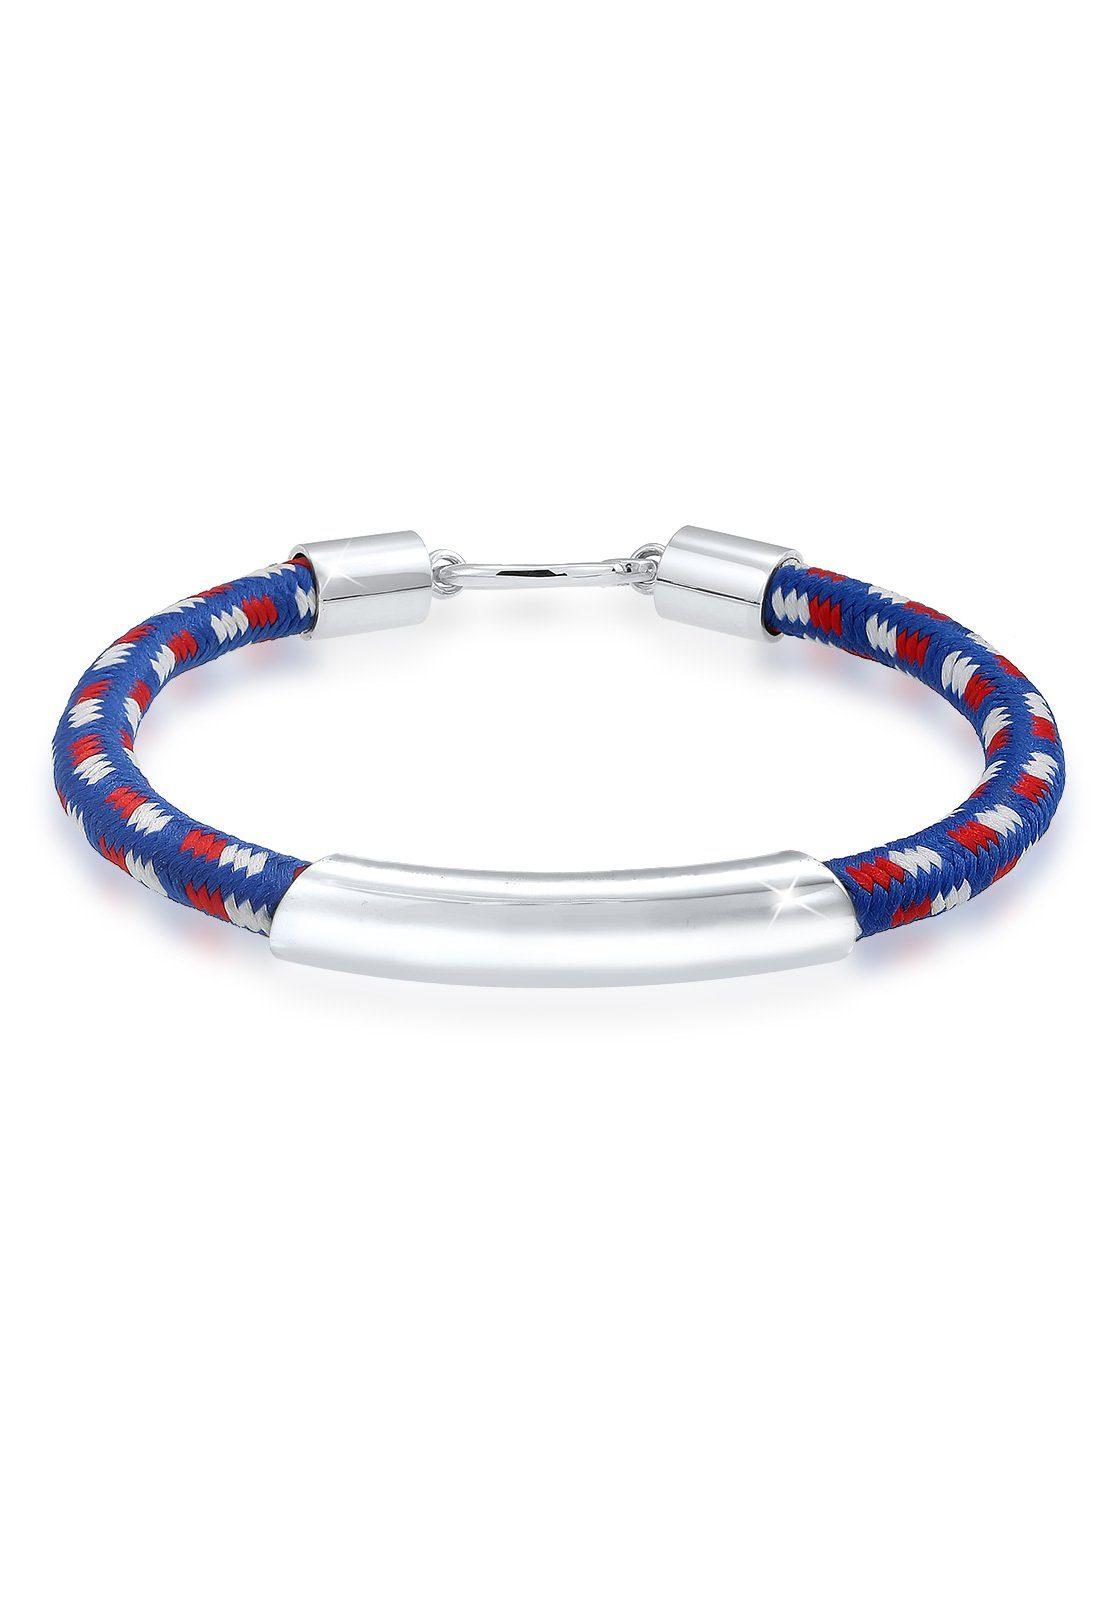 Paulo Fanello Armband Haken Basic Textil 925 Sterling Silber | Schmuck > Armbänder > Silberarmbänder | Paulo Fanello